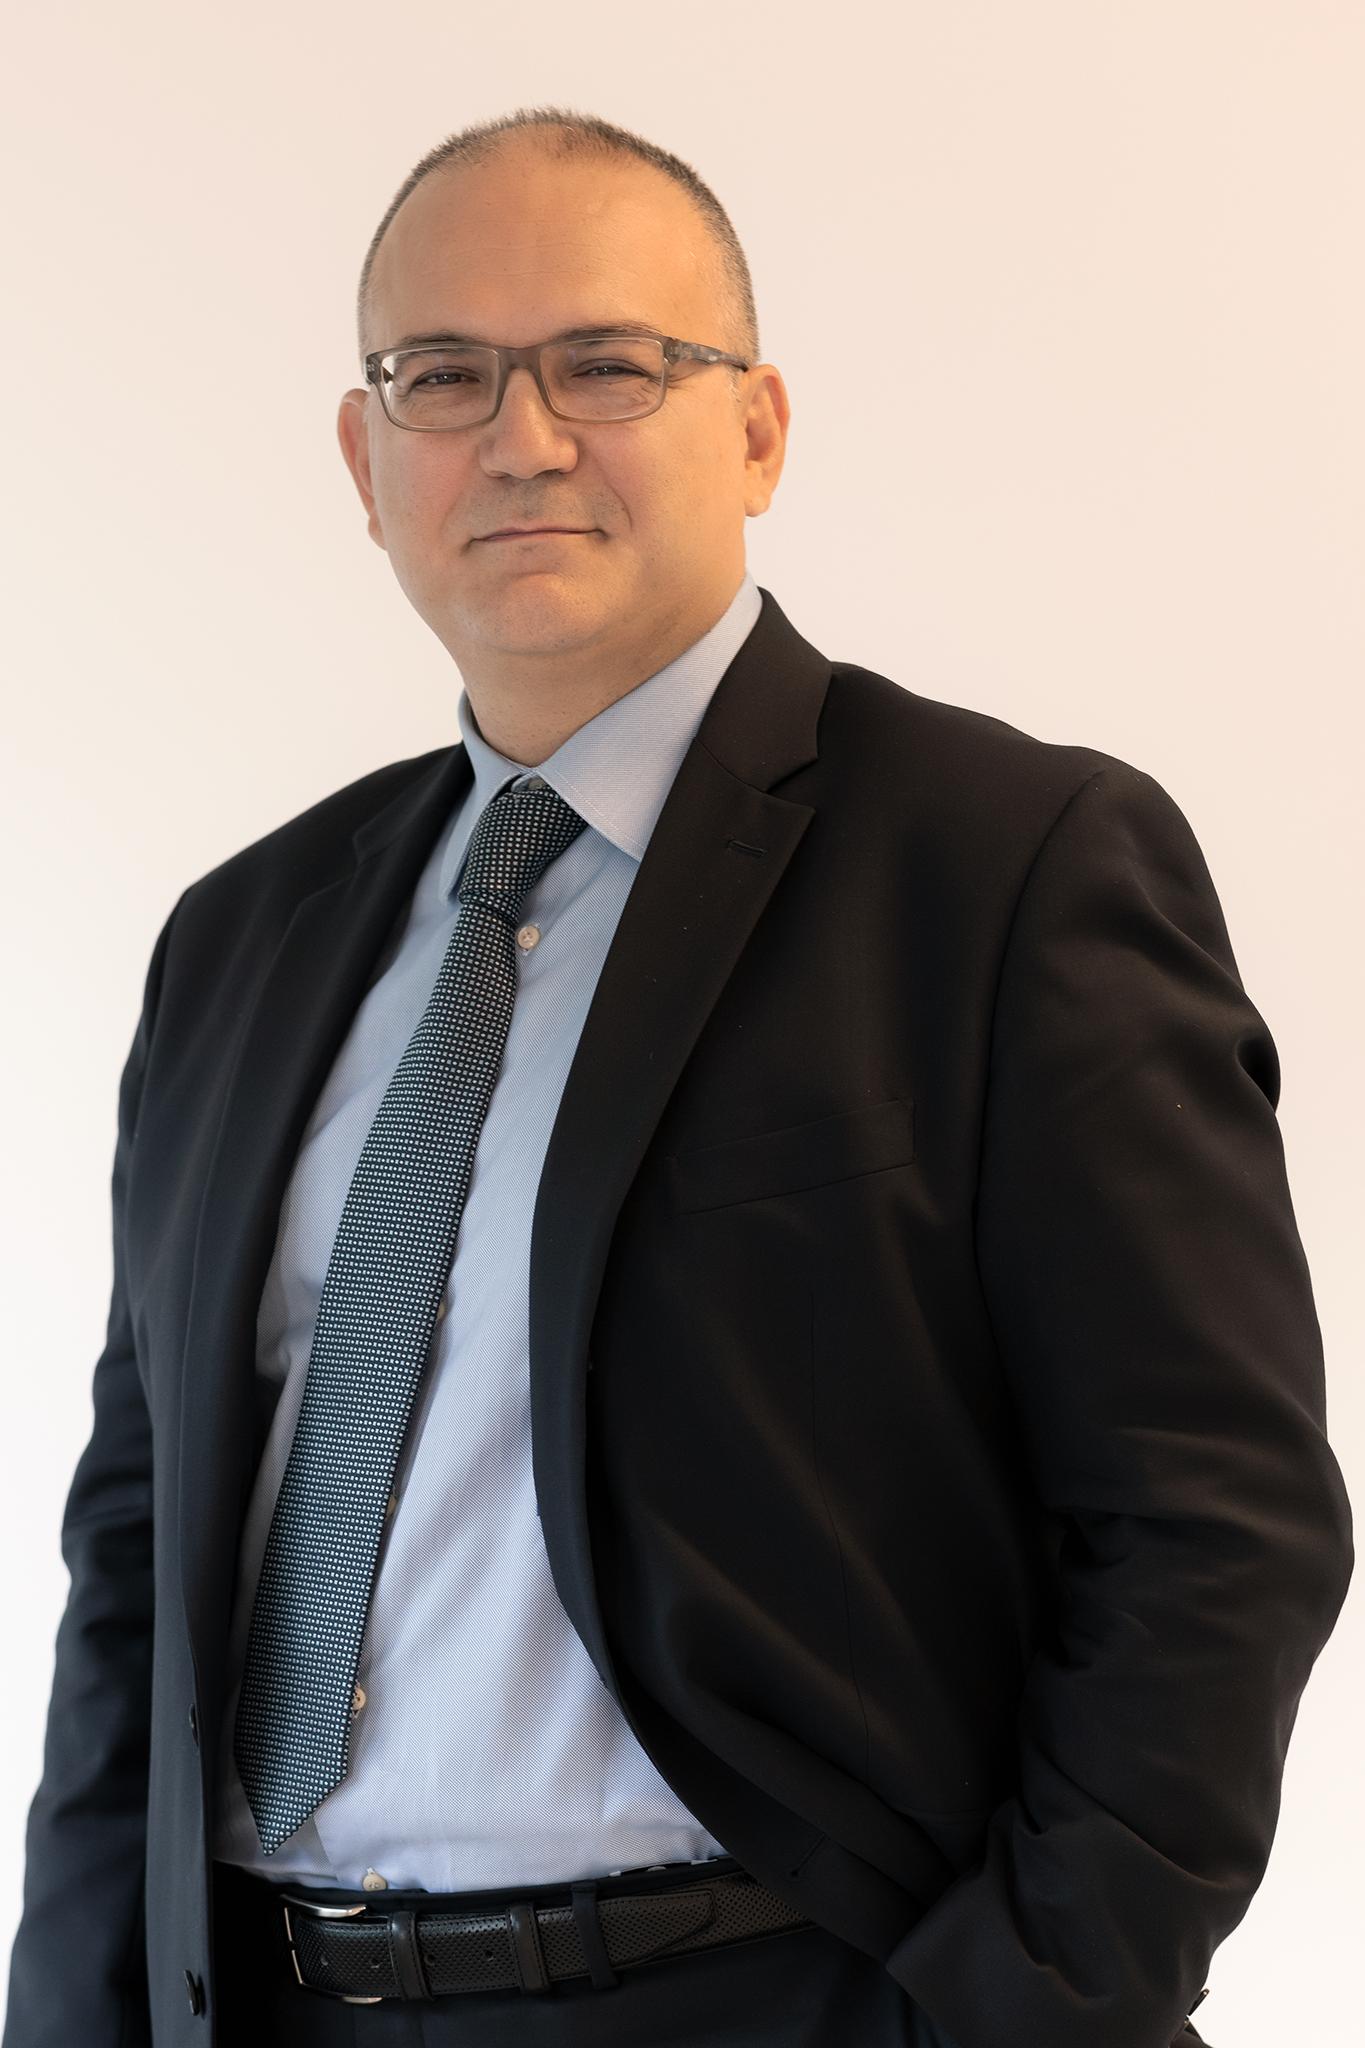 Marco Ciavarella arriva ad Almawave come Partnership & Channel Manager